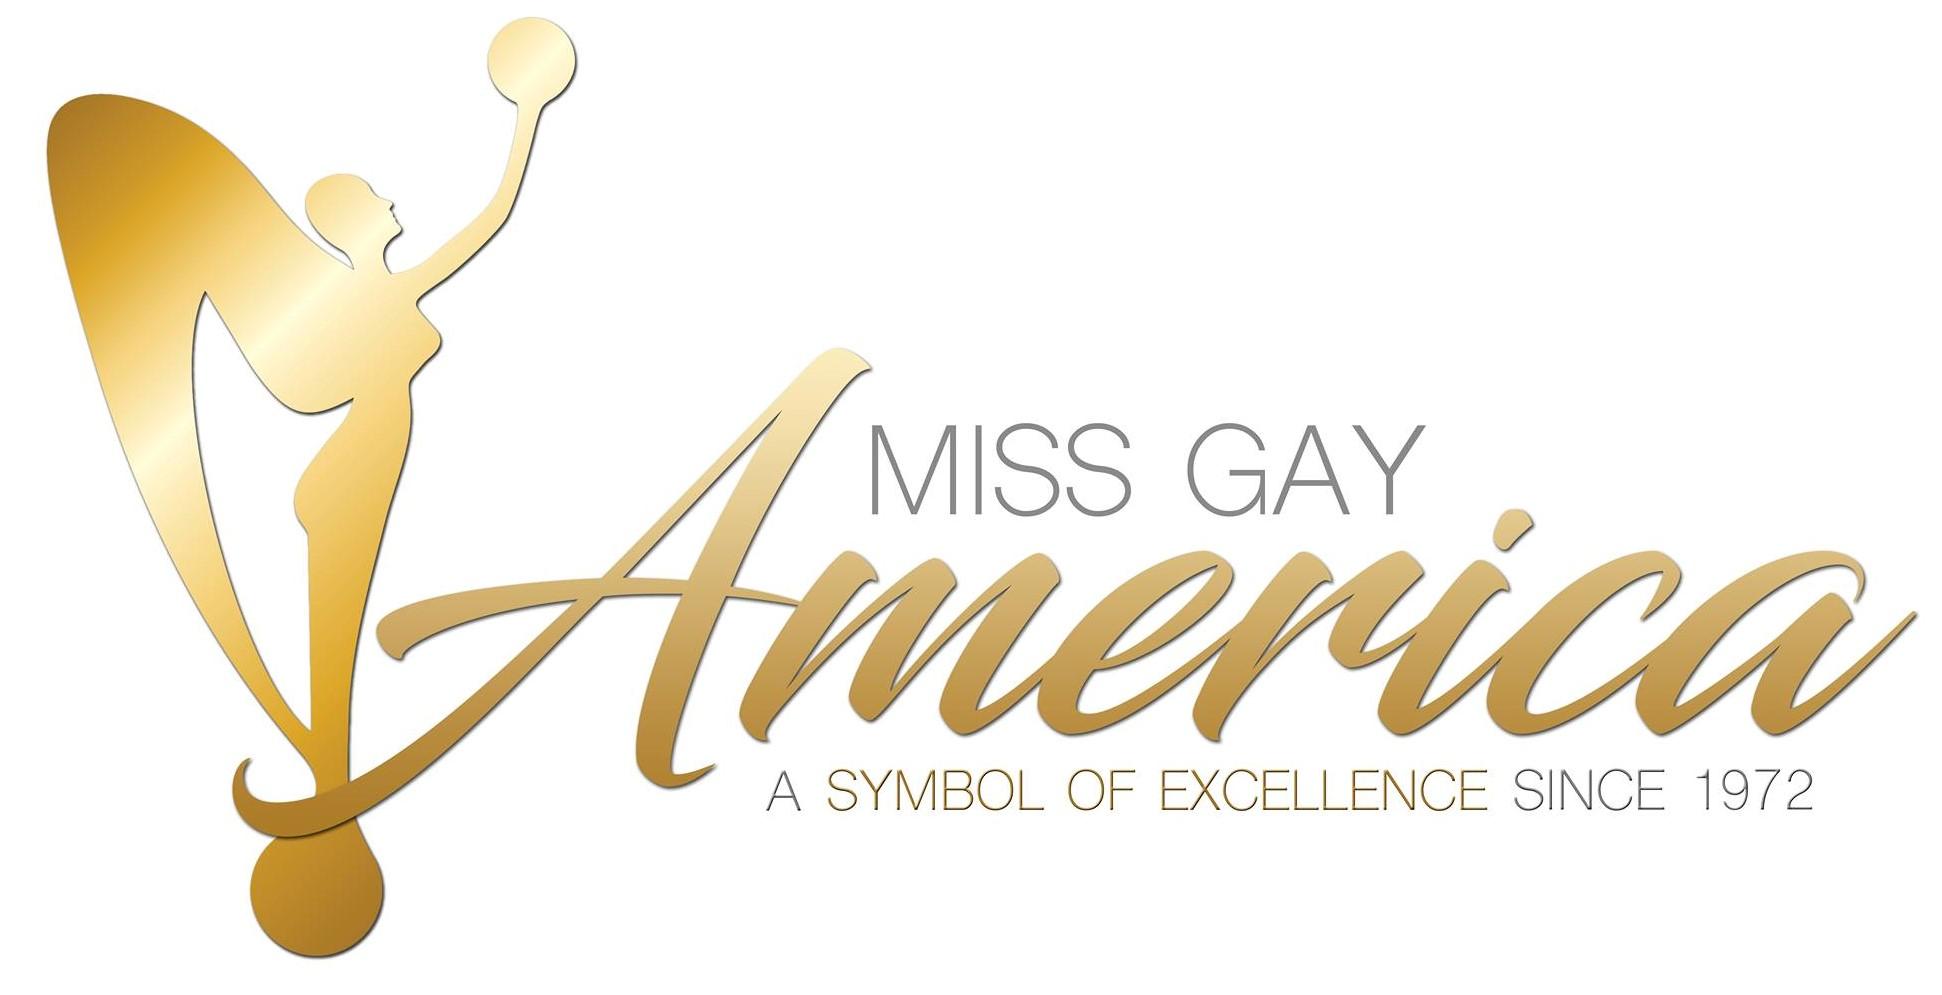 Miss Gay America